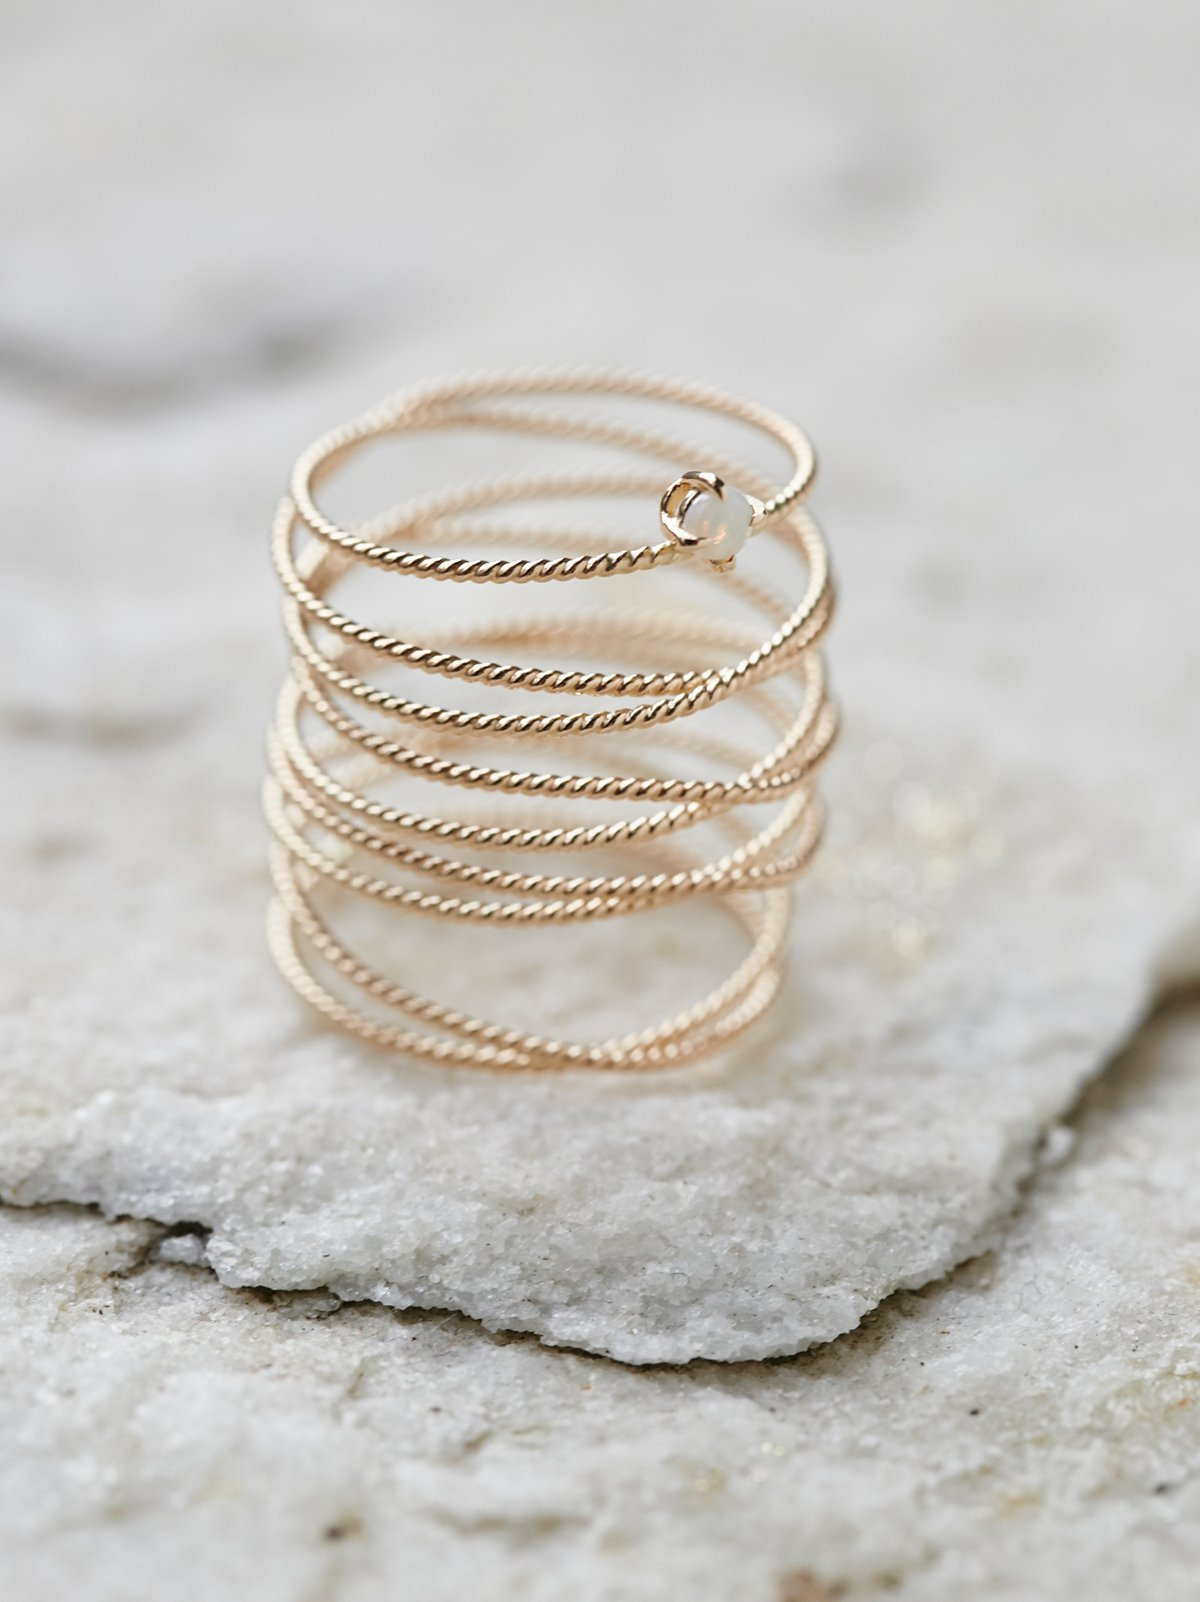 Amelia蛋白石环绕戒指